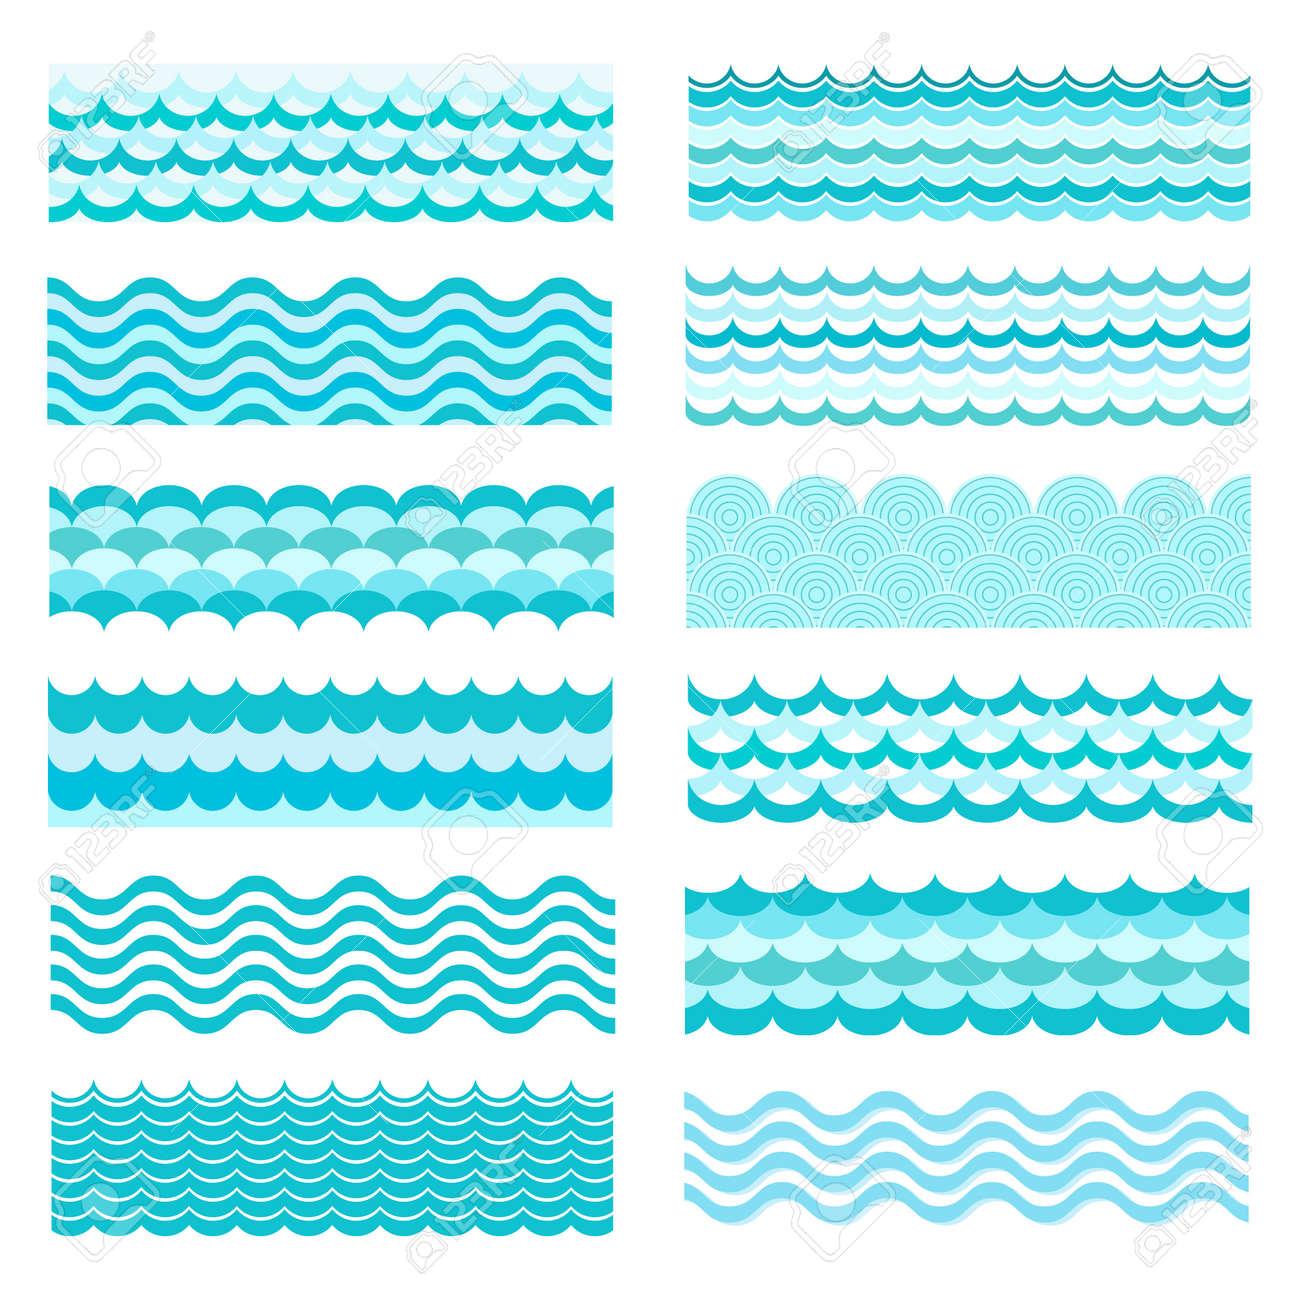 collection of marine waves sea wavy ocean art water design